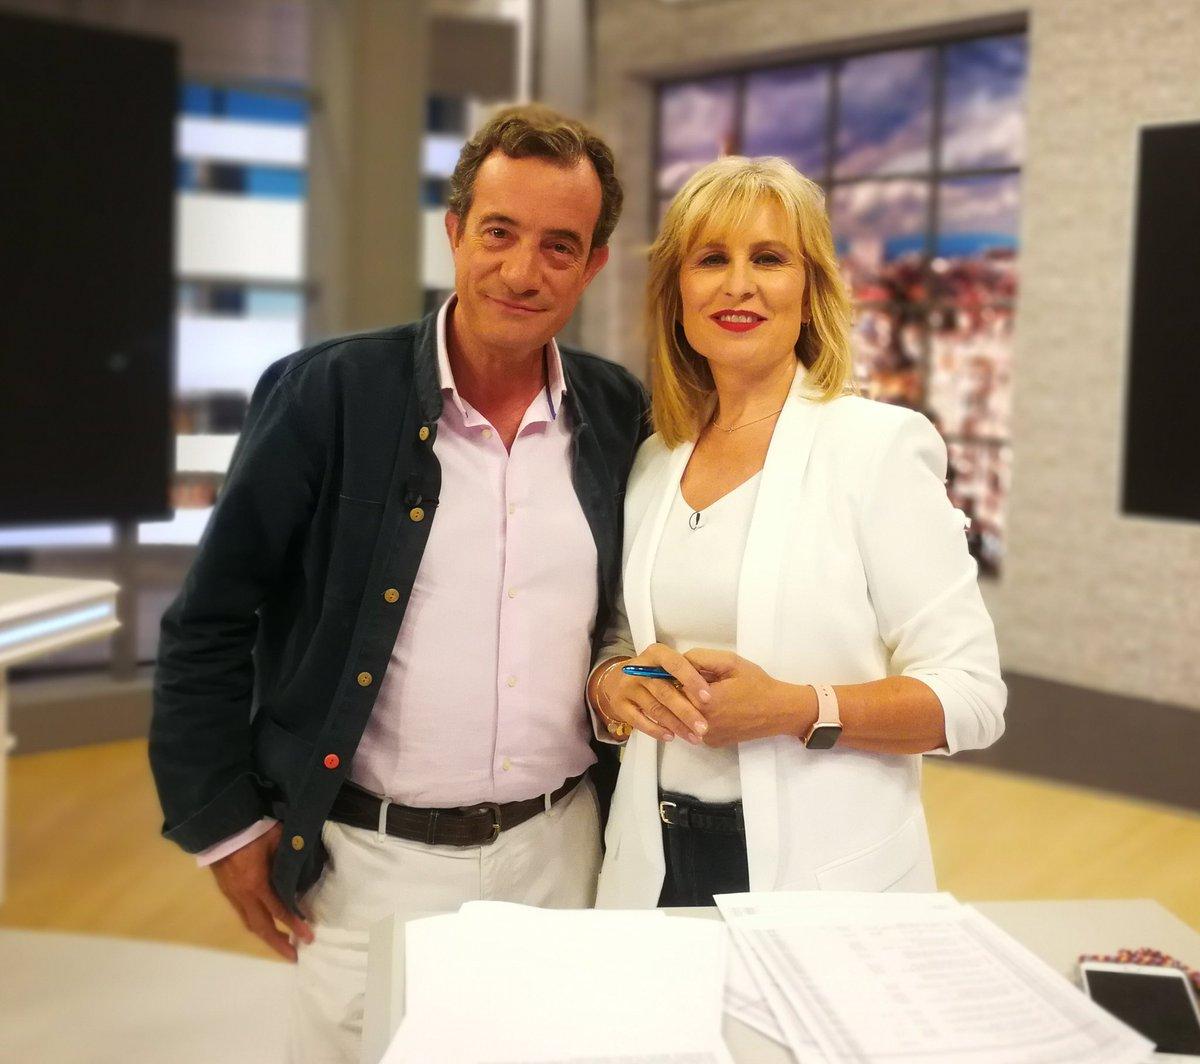 @telemadrid @120minutosTM  Con @maria_rey , siempre elegante... 😉 https://t.co/AugsCfgQGu